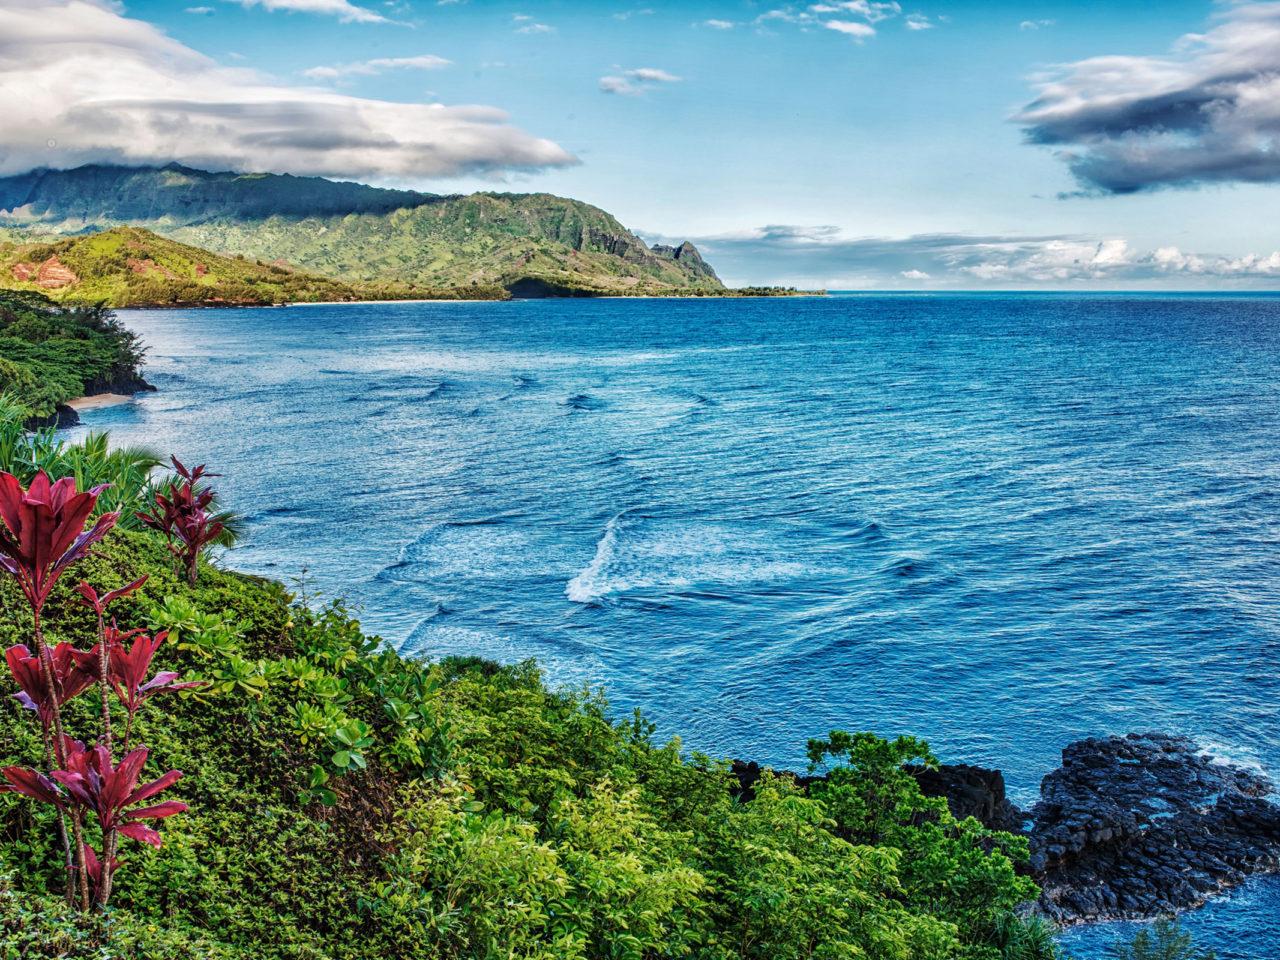 Surf Wallpaper Iphone X View Of Bali Hai Mount Makana From Pali Ke Kua Princeville